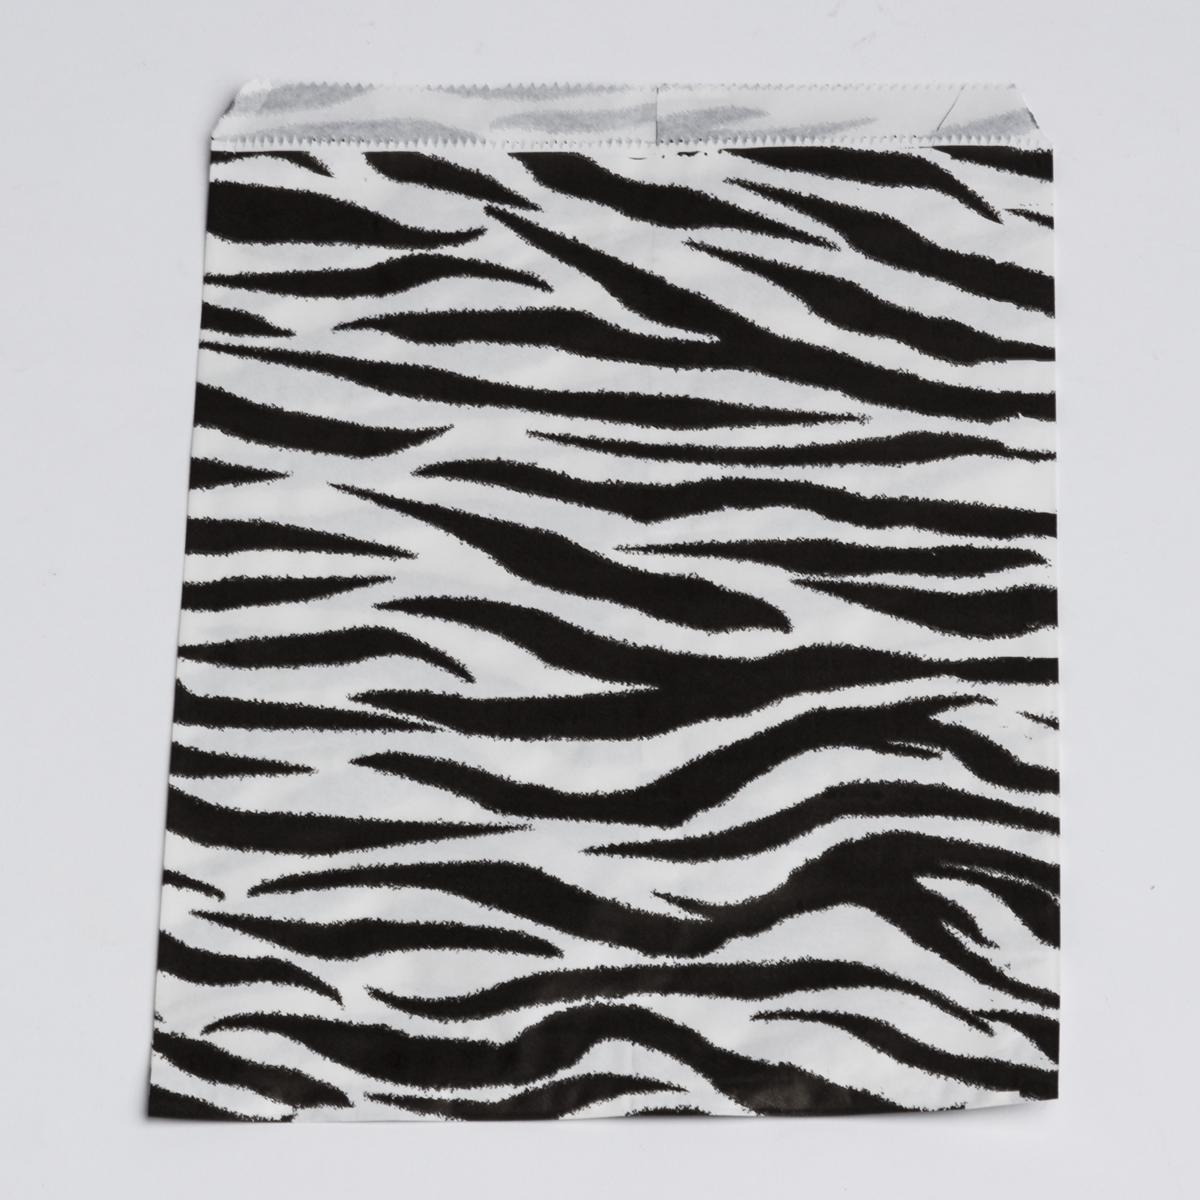 ZEBRA FLAT PAPER BAGS